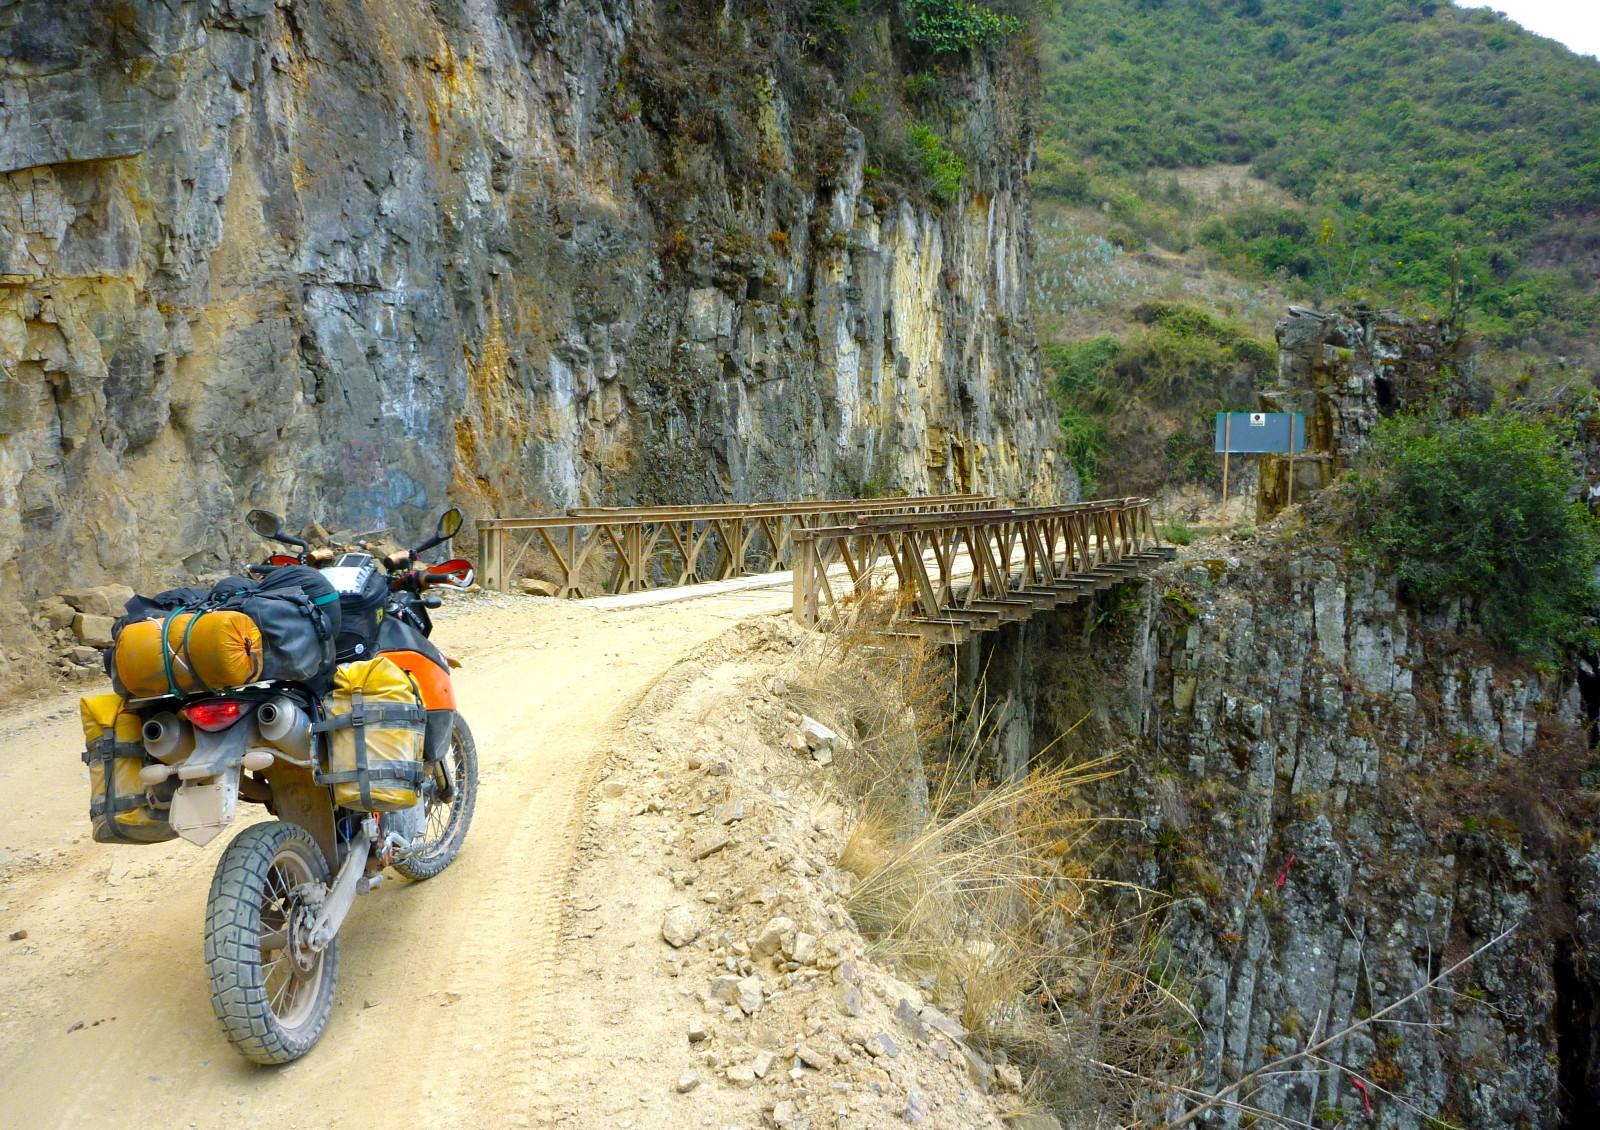 Little bridge big gorge